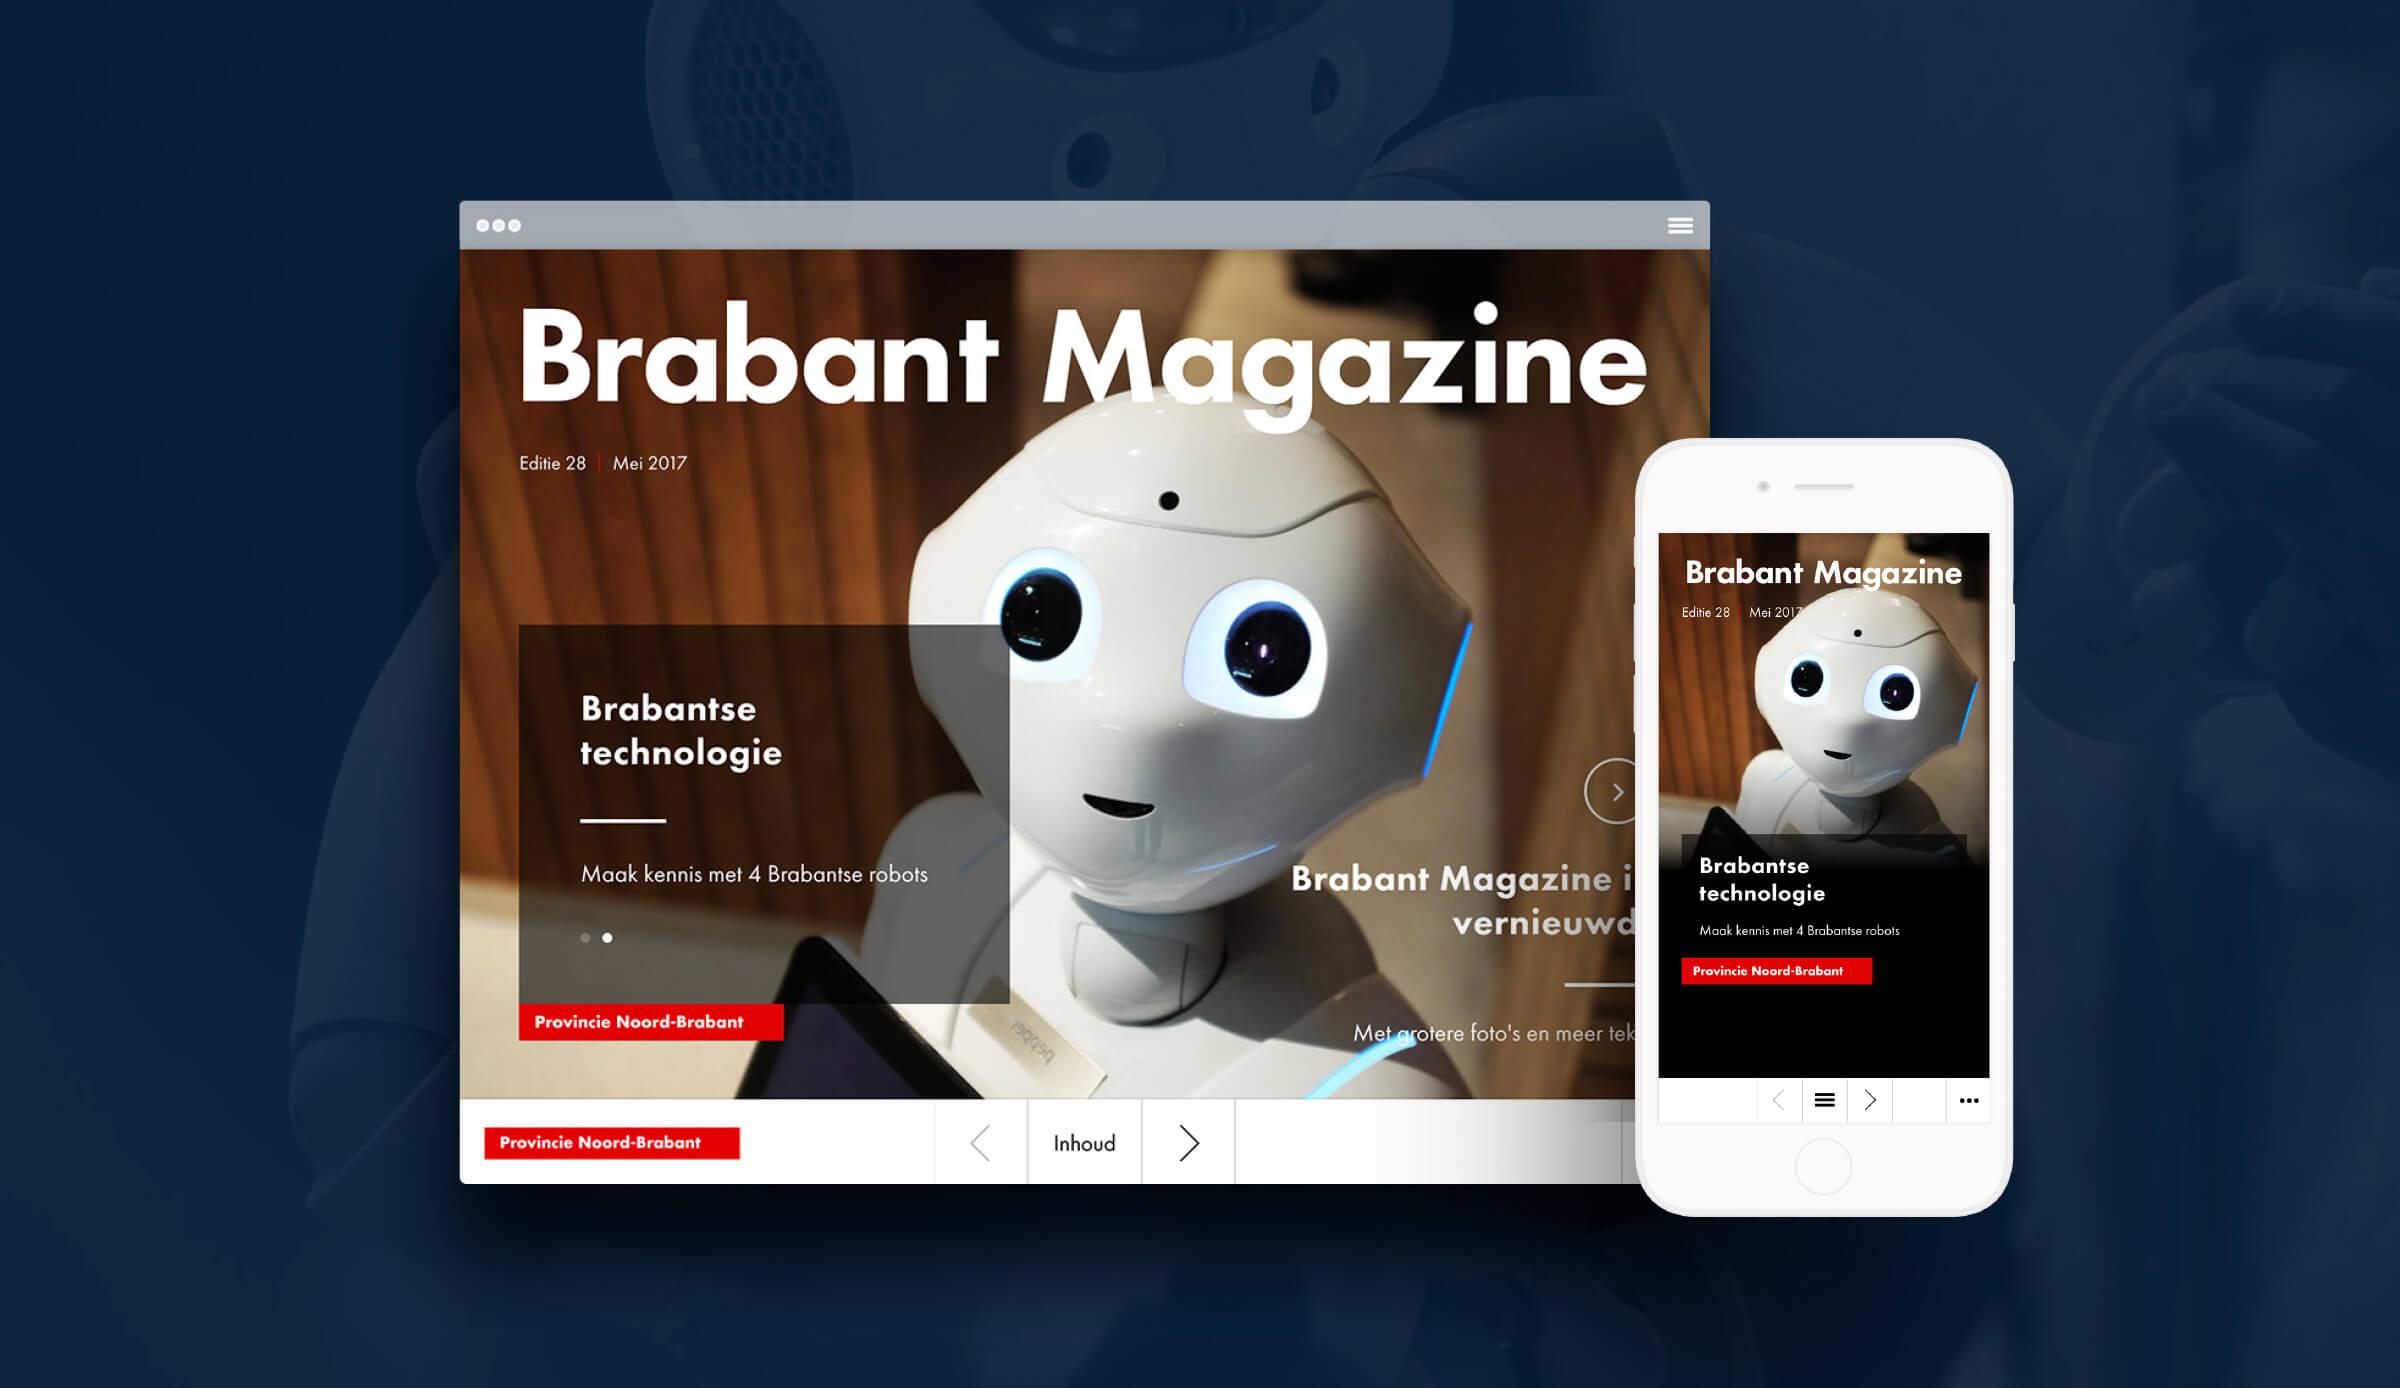 brabant_magazine_case_01_eerstebeeld-ok